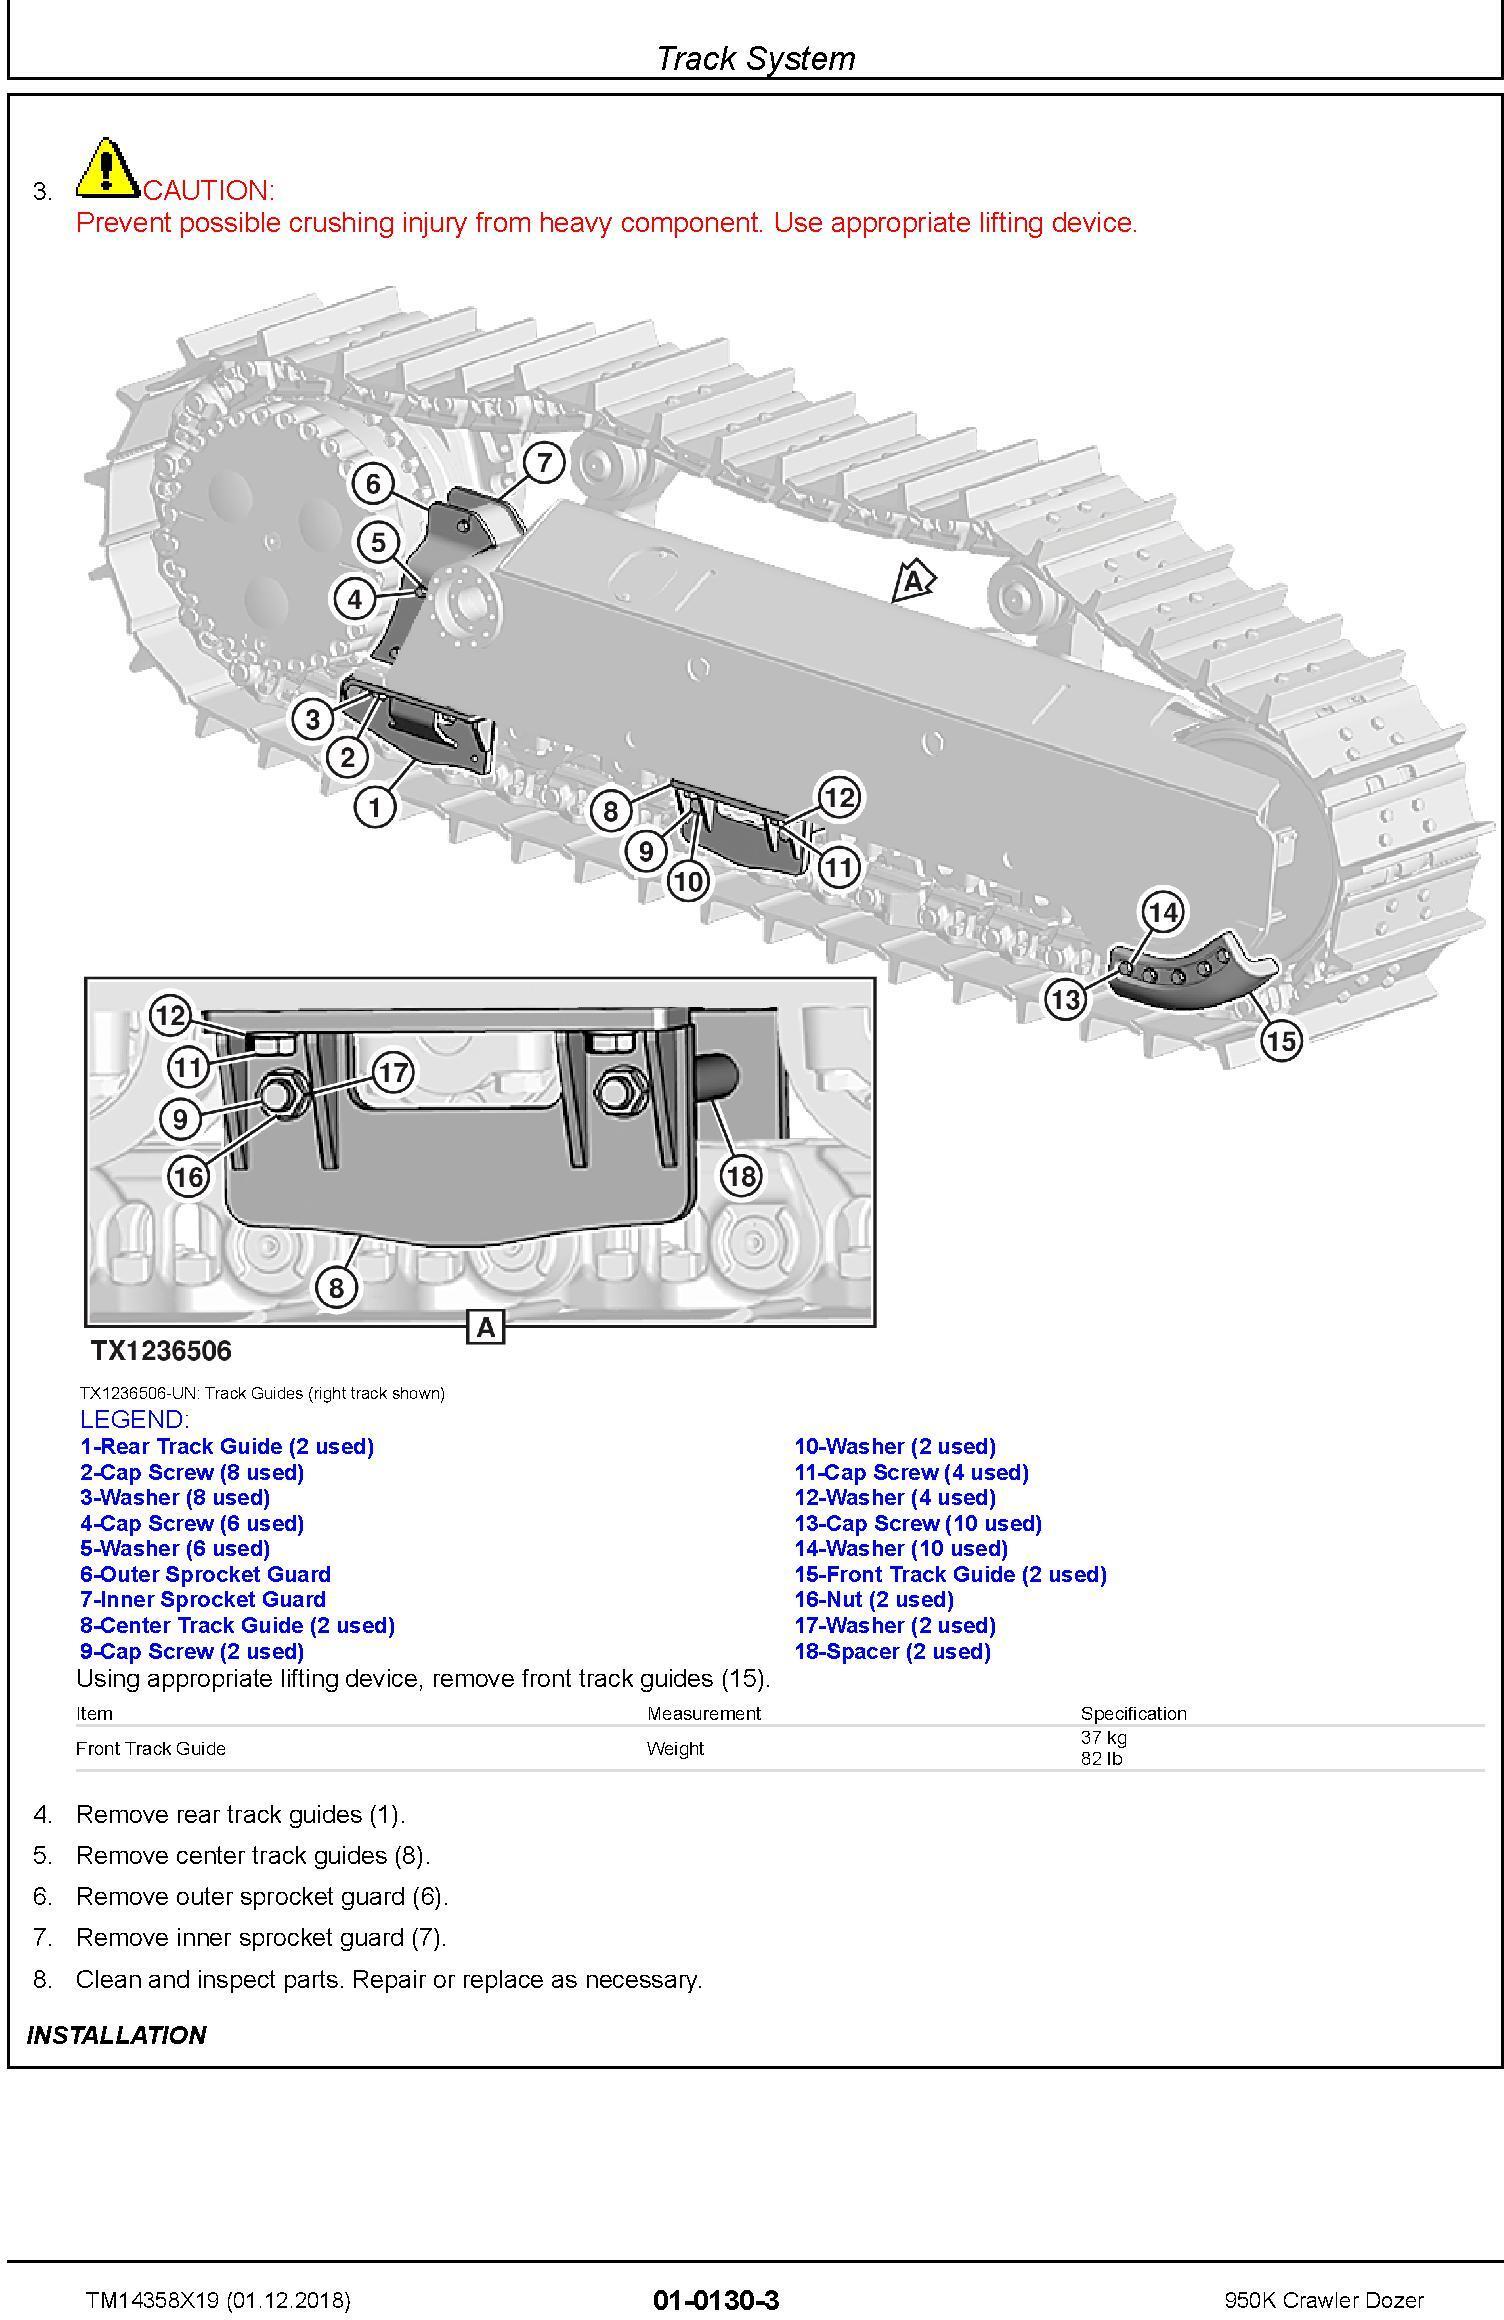 John Deere 950K Crawler Dozer Repair Technical Manual (TM14358X19) - 1